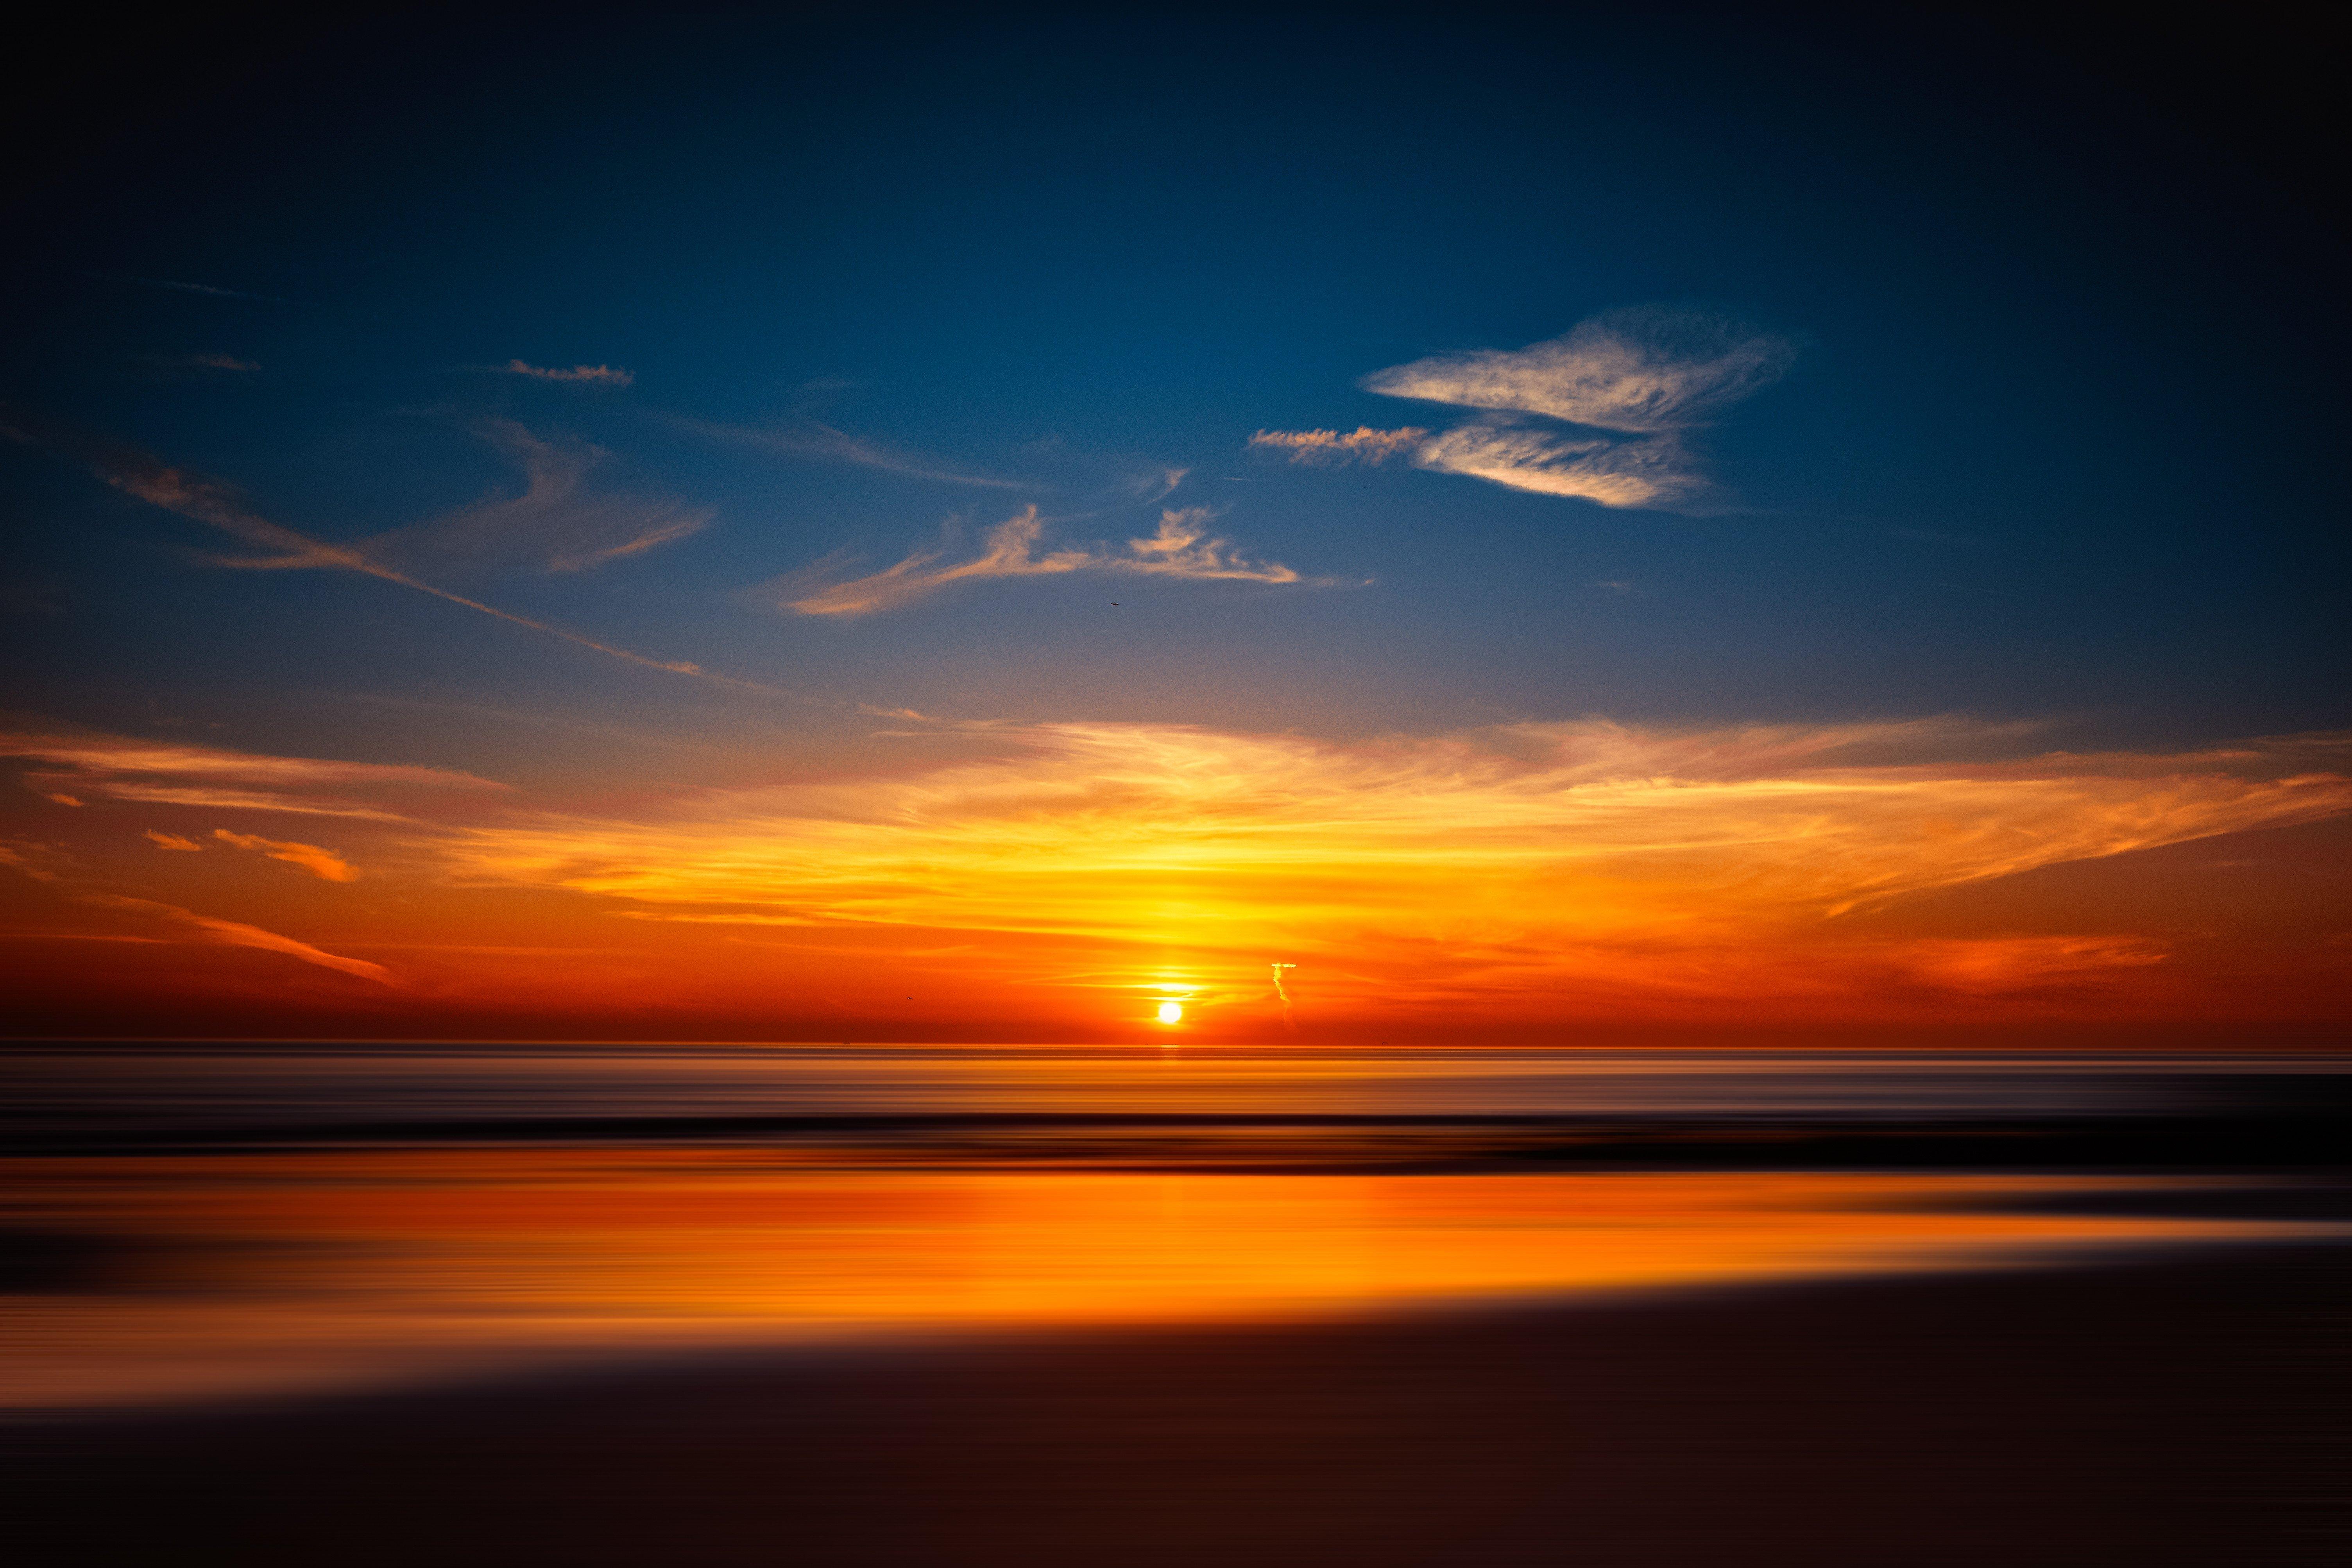 Fondos de pantalla Atardecer naranja en la playa